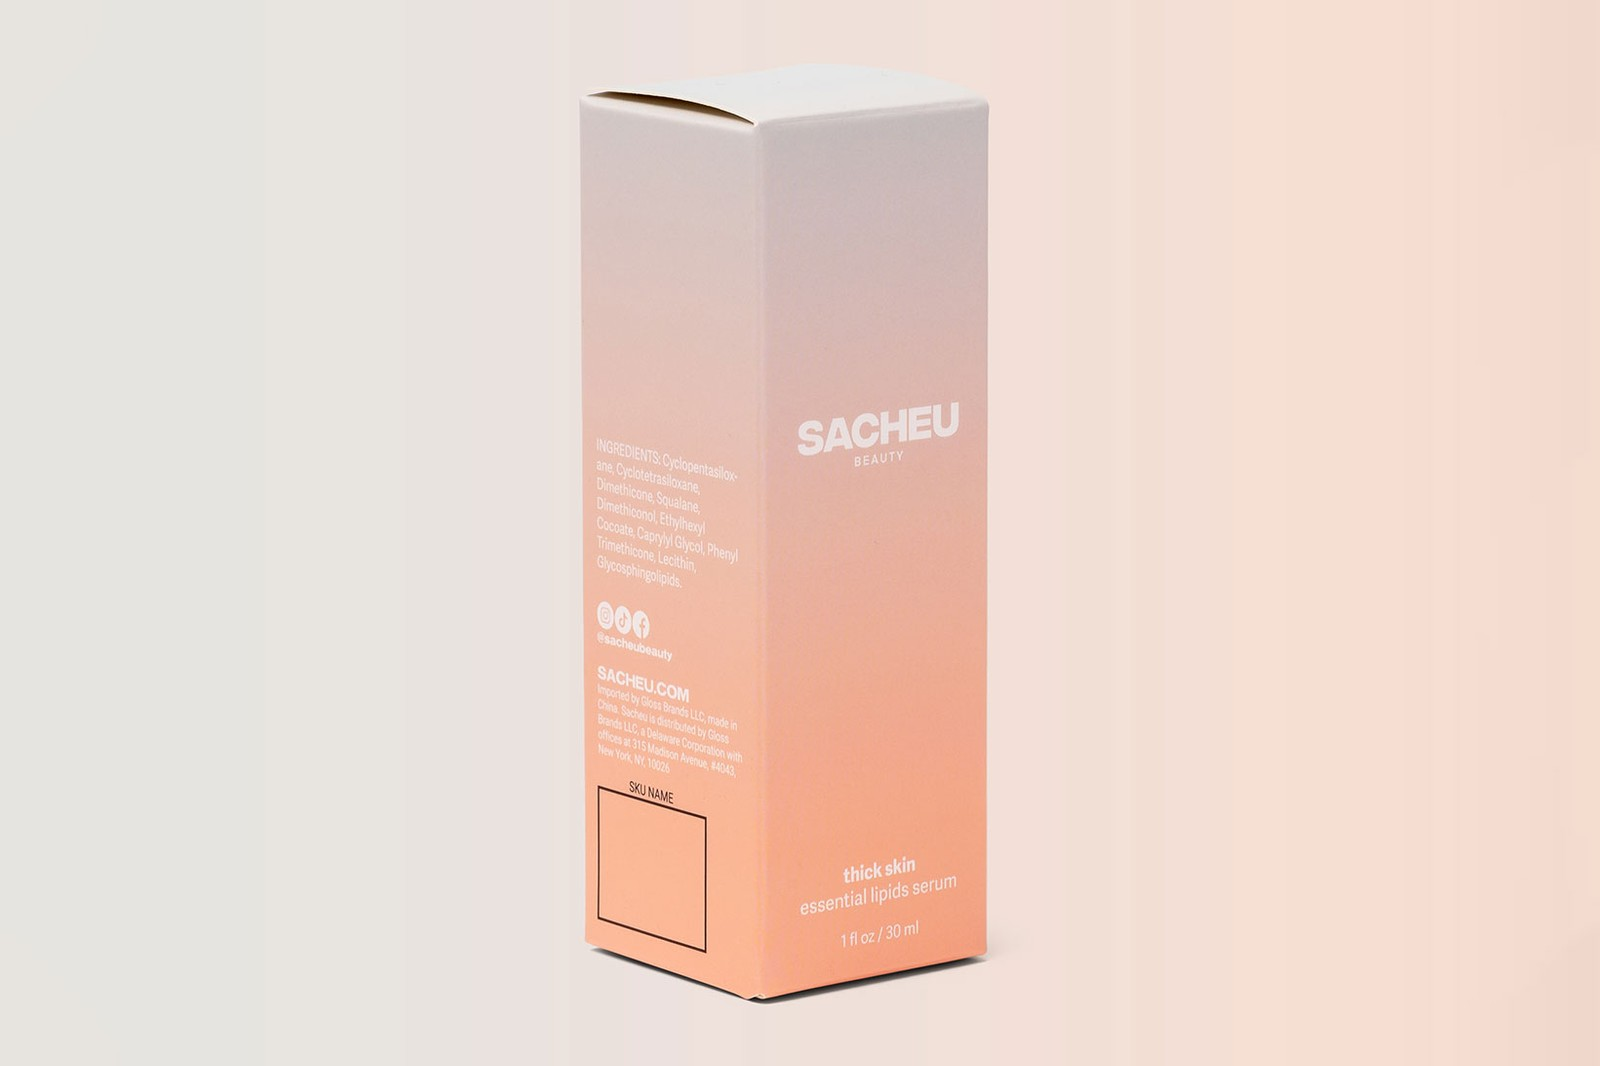 SACHEU Beauty Sarah Cheung YouTuber Thick Skin Serum Skincare Essential Lipids Packaging